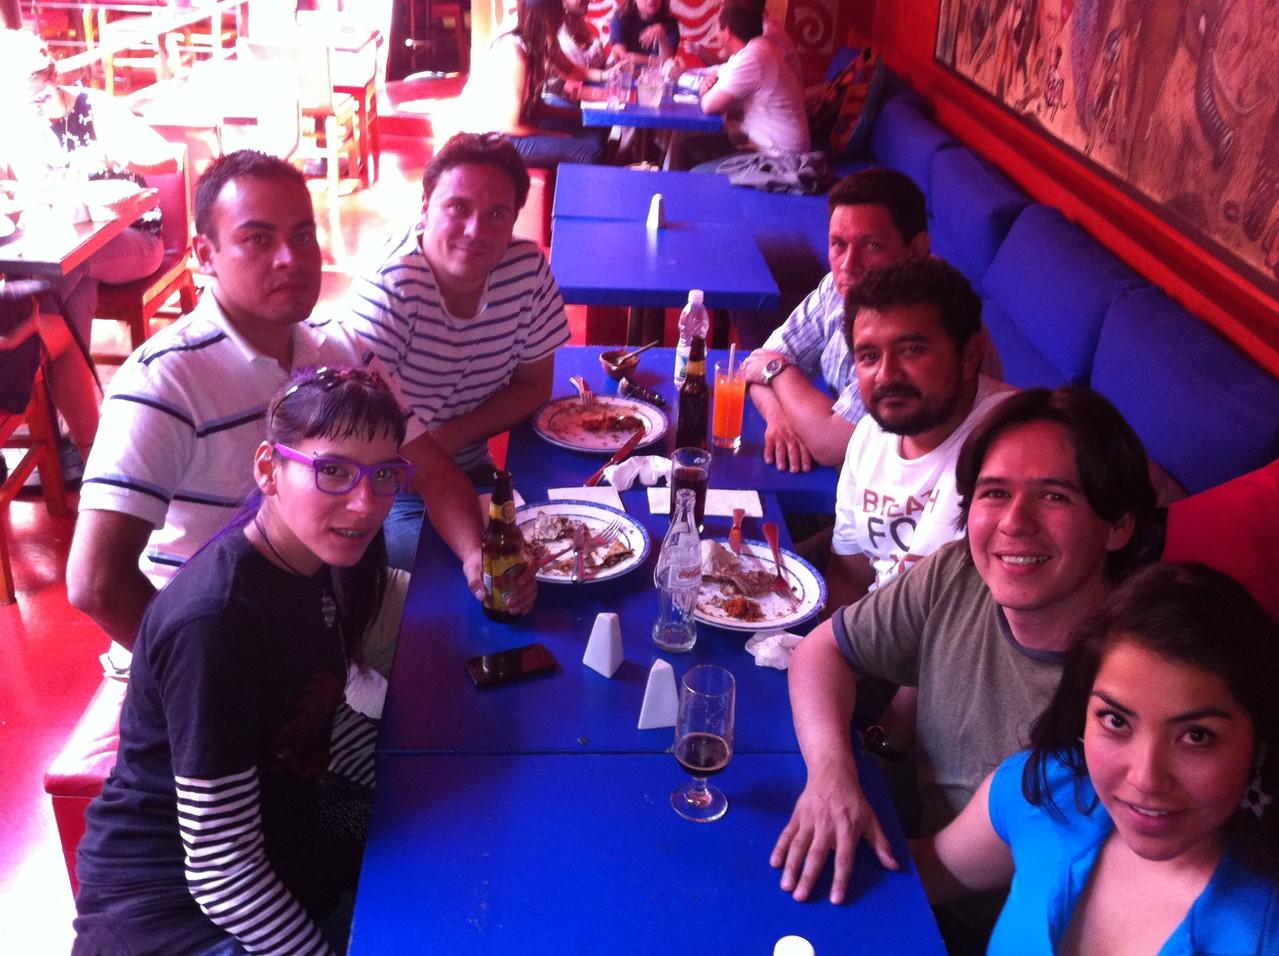 En México, con Glafira Rocha, Alí Calderón, Mijail Lamas, Xavier Oquendo y Jorge Galán.